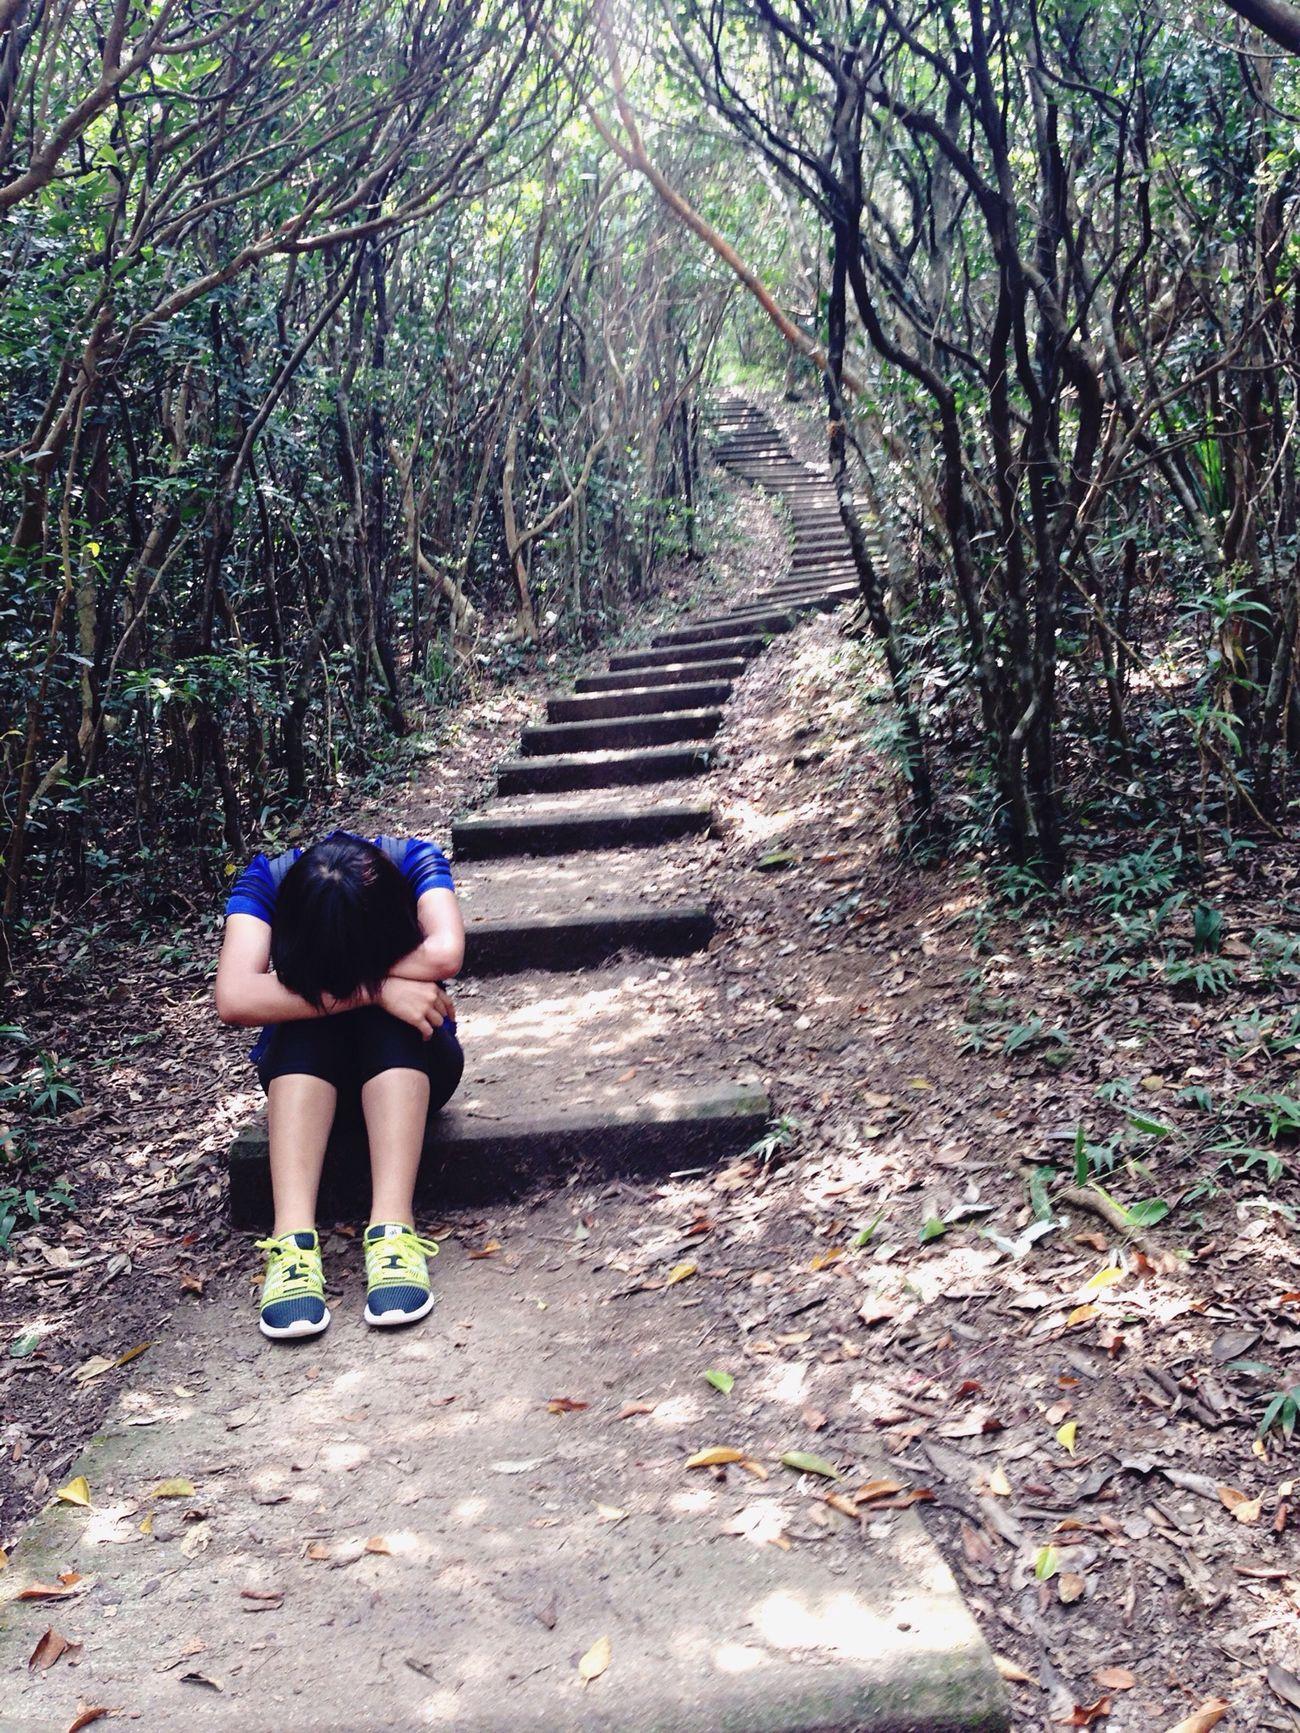 Nature Thats Me  Tired! Relaxing On A Hike Take A Break Indonesian Girls My Feet Hurt Hongkonger